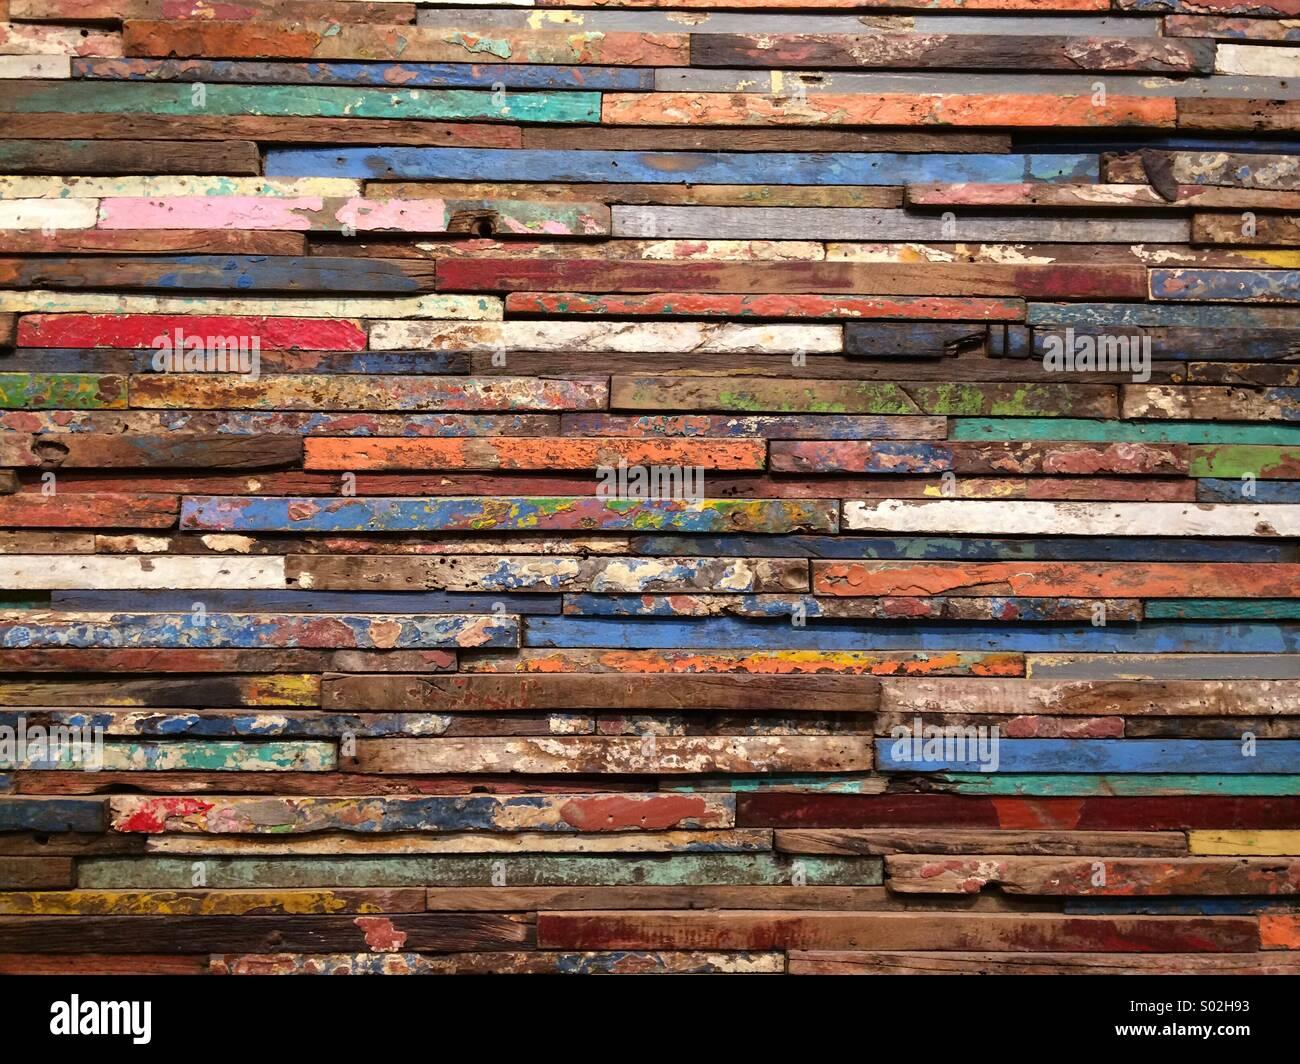 Repurposed Wood (horizontal) windows frames reused as wall art - Stock Image